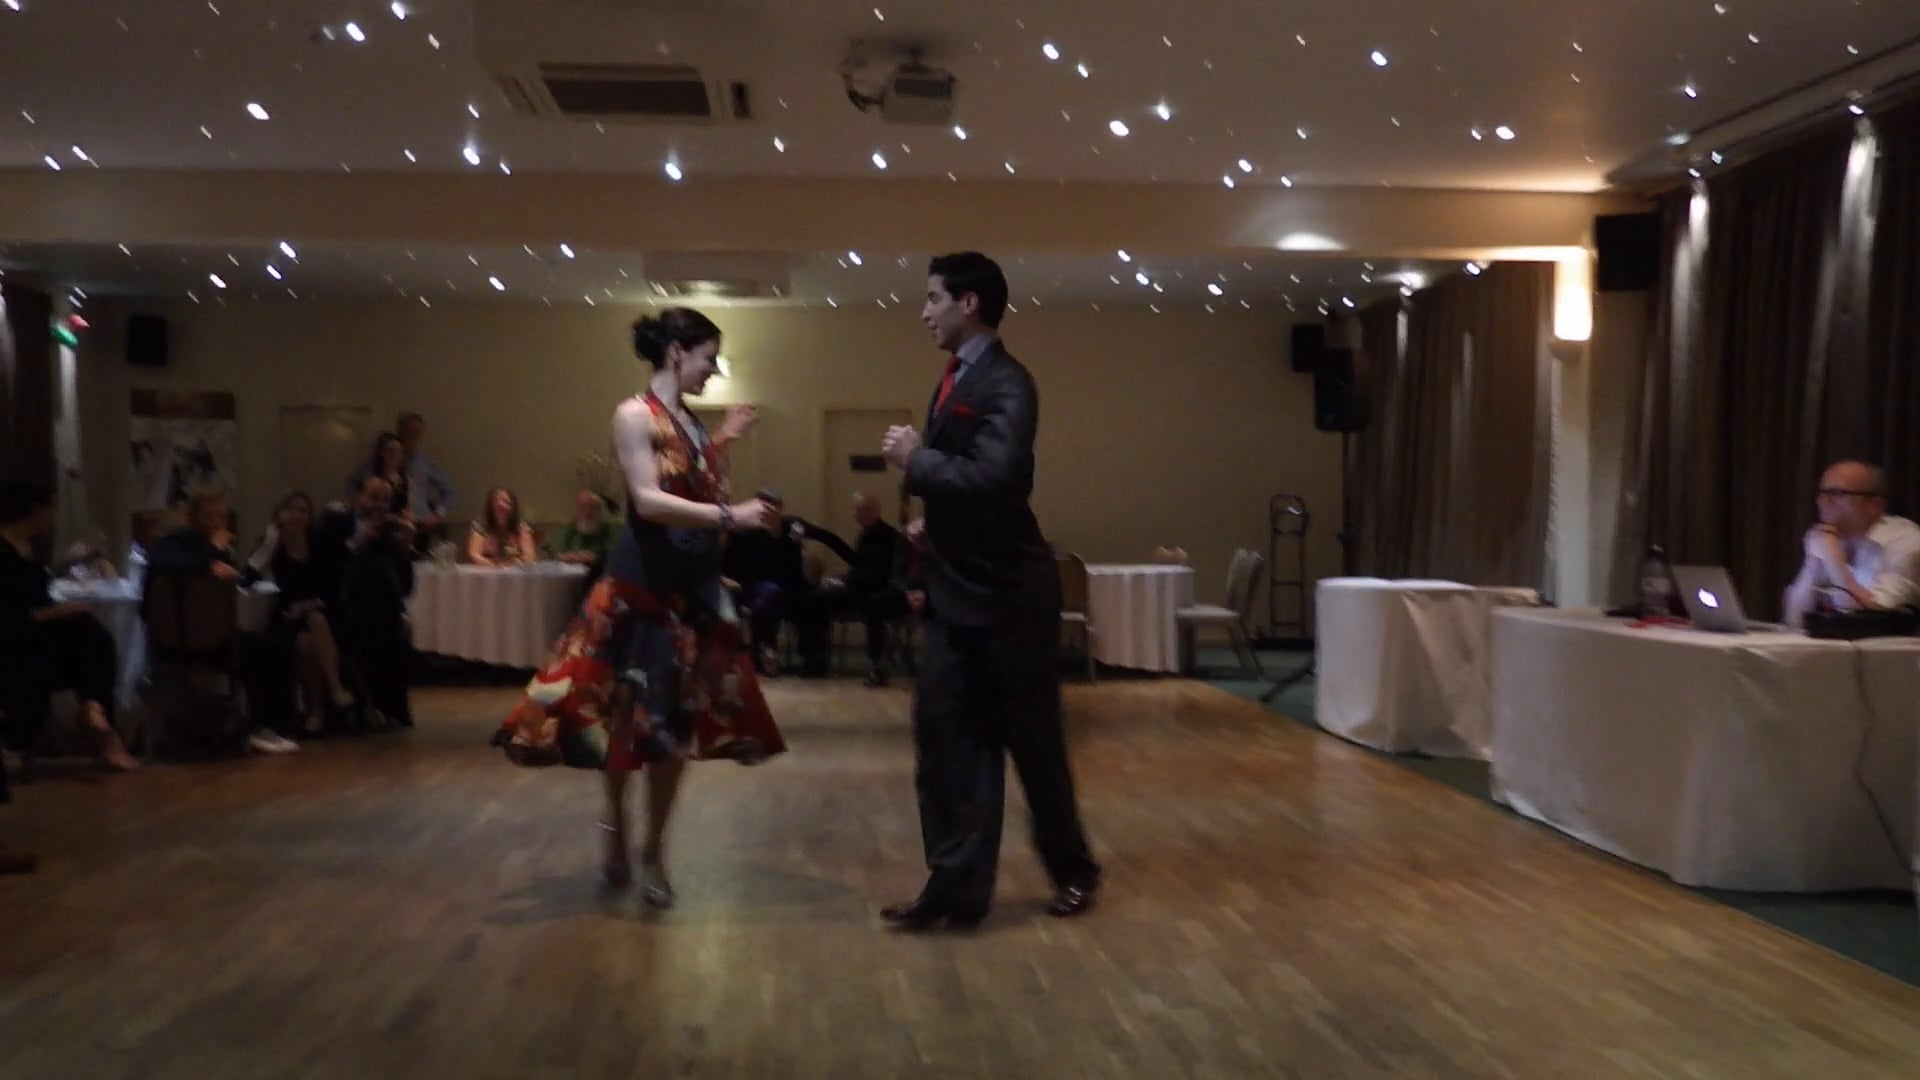 Jenny & Ricardo Oria, Inverness-Scotland, Feb'17, Milonga